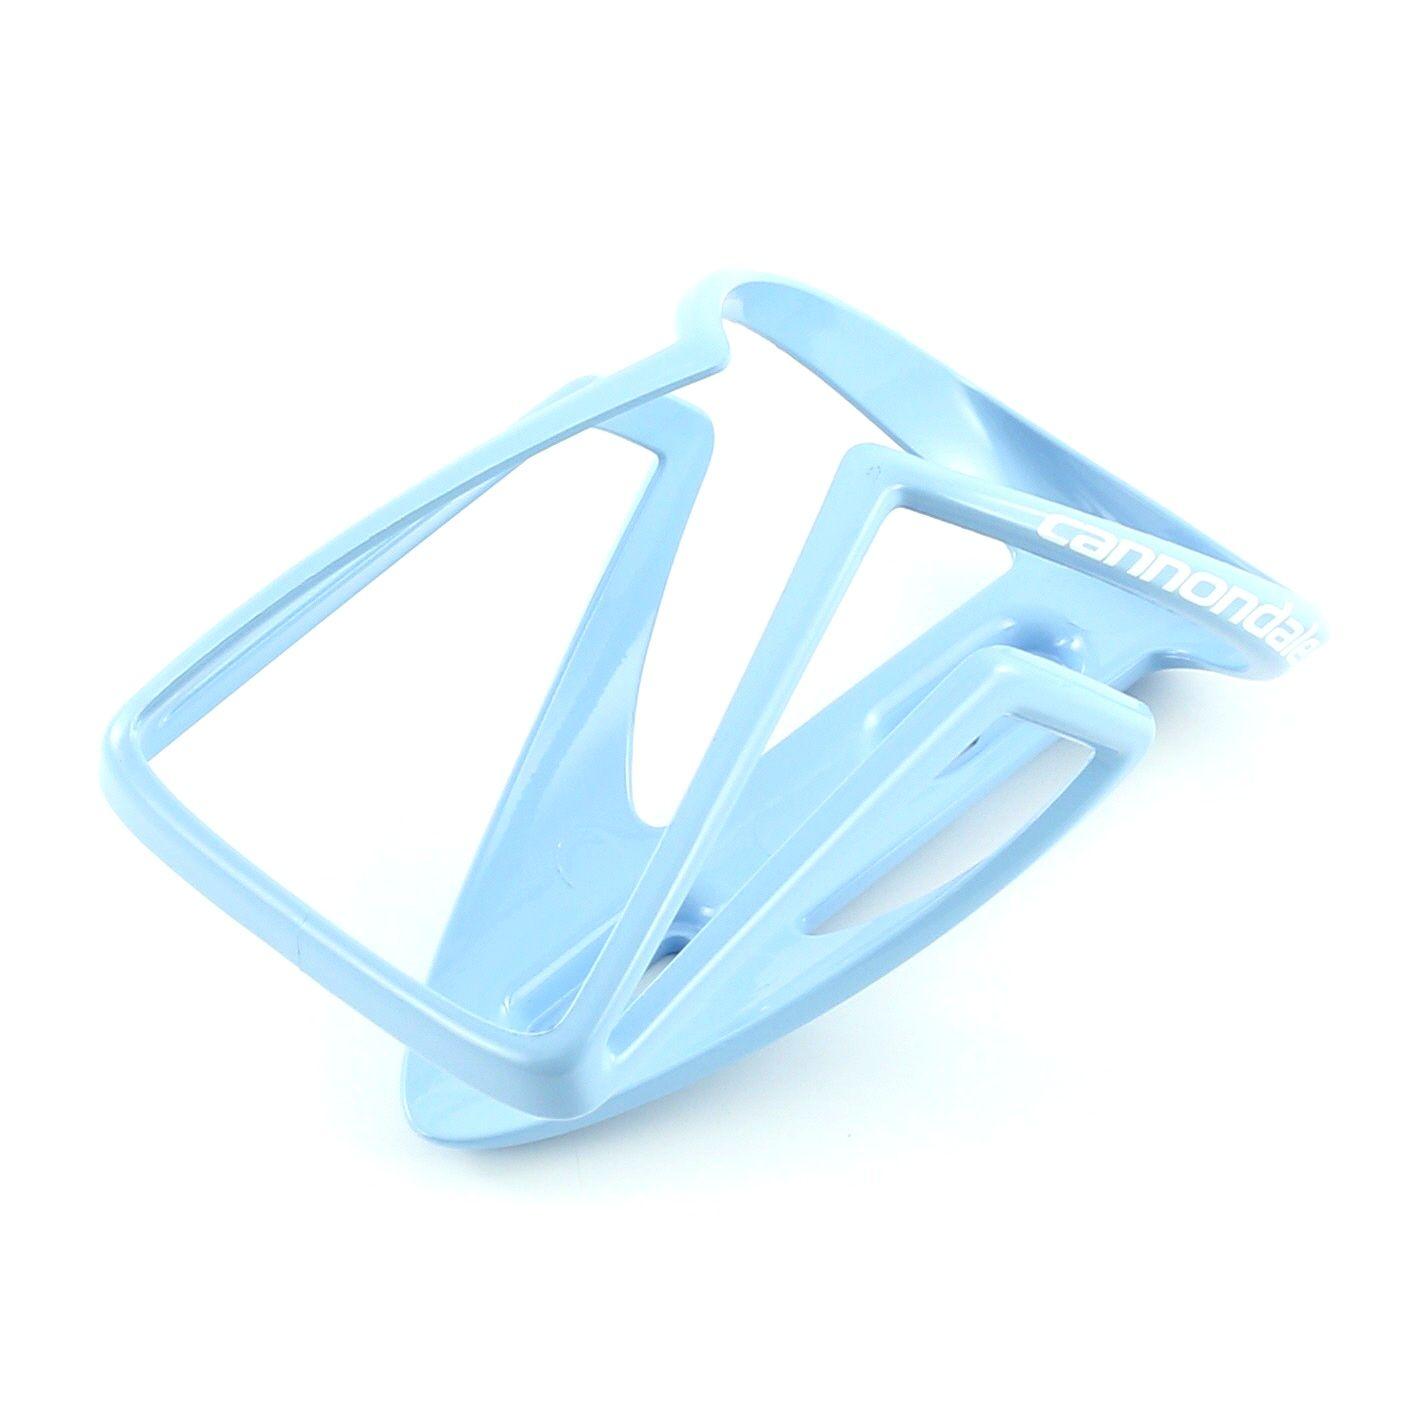 Porte-bidon Cannondale Nylon Speed-C (Bleu)